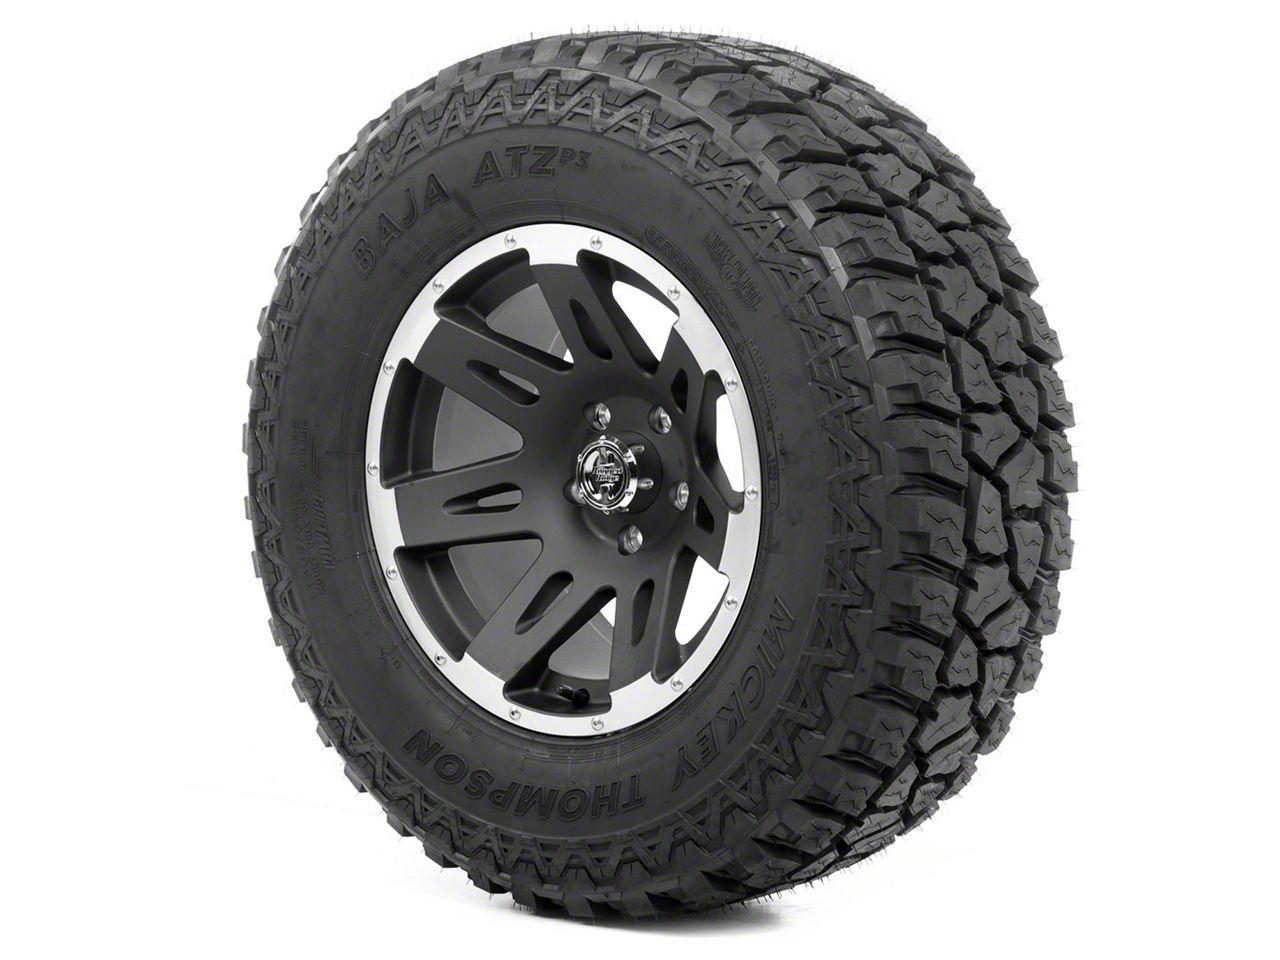 Rugged Ridge XHD Wheel 17x9 Black Satin w/ Machined Lip and Mickey Thompson ATZ P3 305/65R17 Tire (07-18 Jeep Wrangler JK)